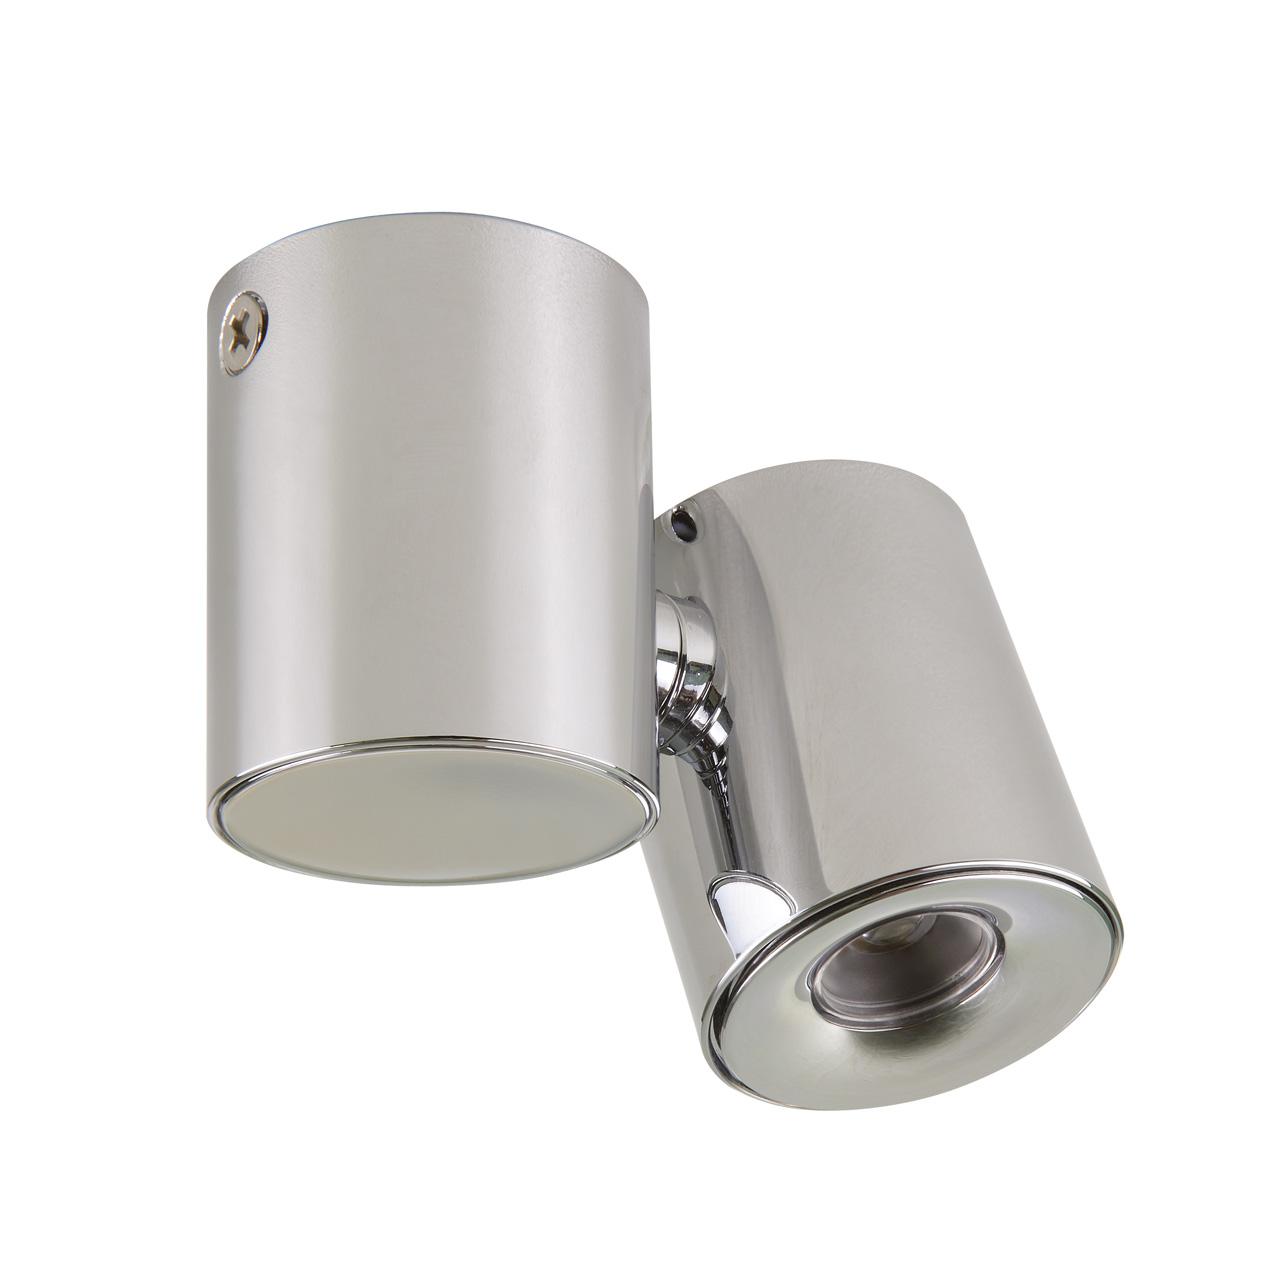 Накладной светильник Lightstar, LED, 3 Вт lightstar lightstar g5 3 3w 4200k 940904